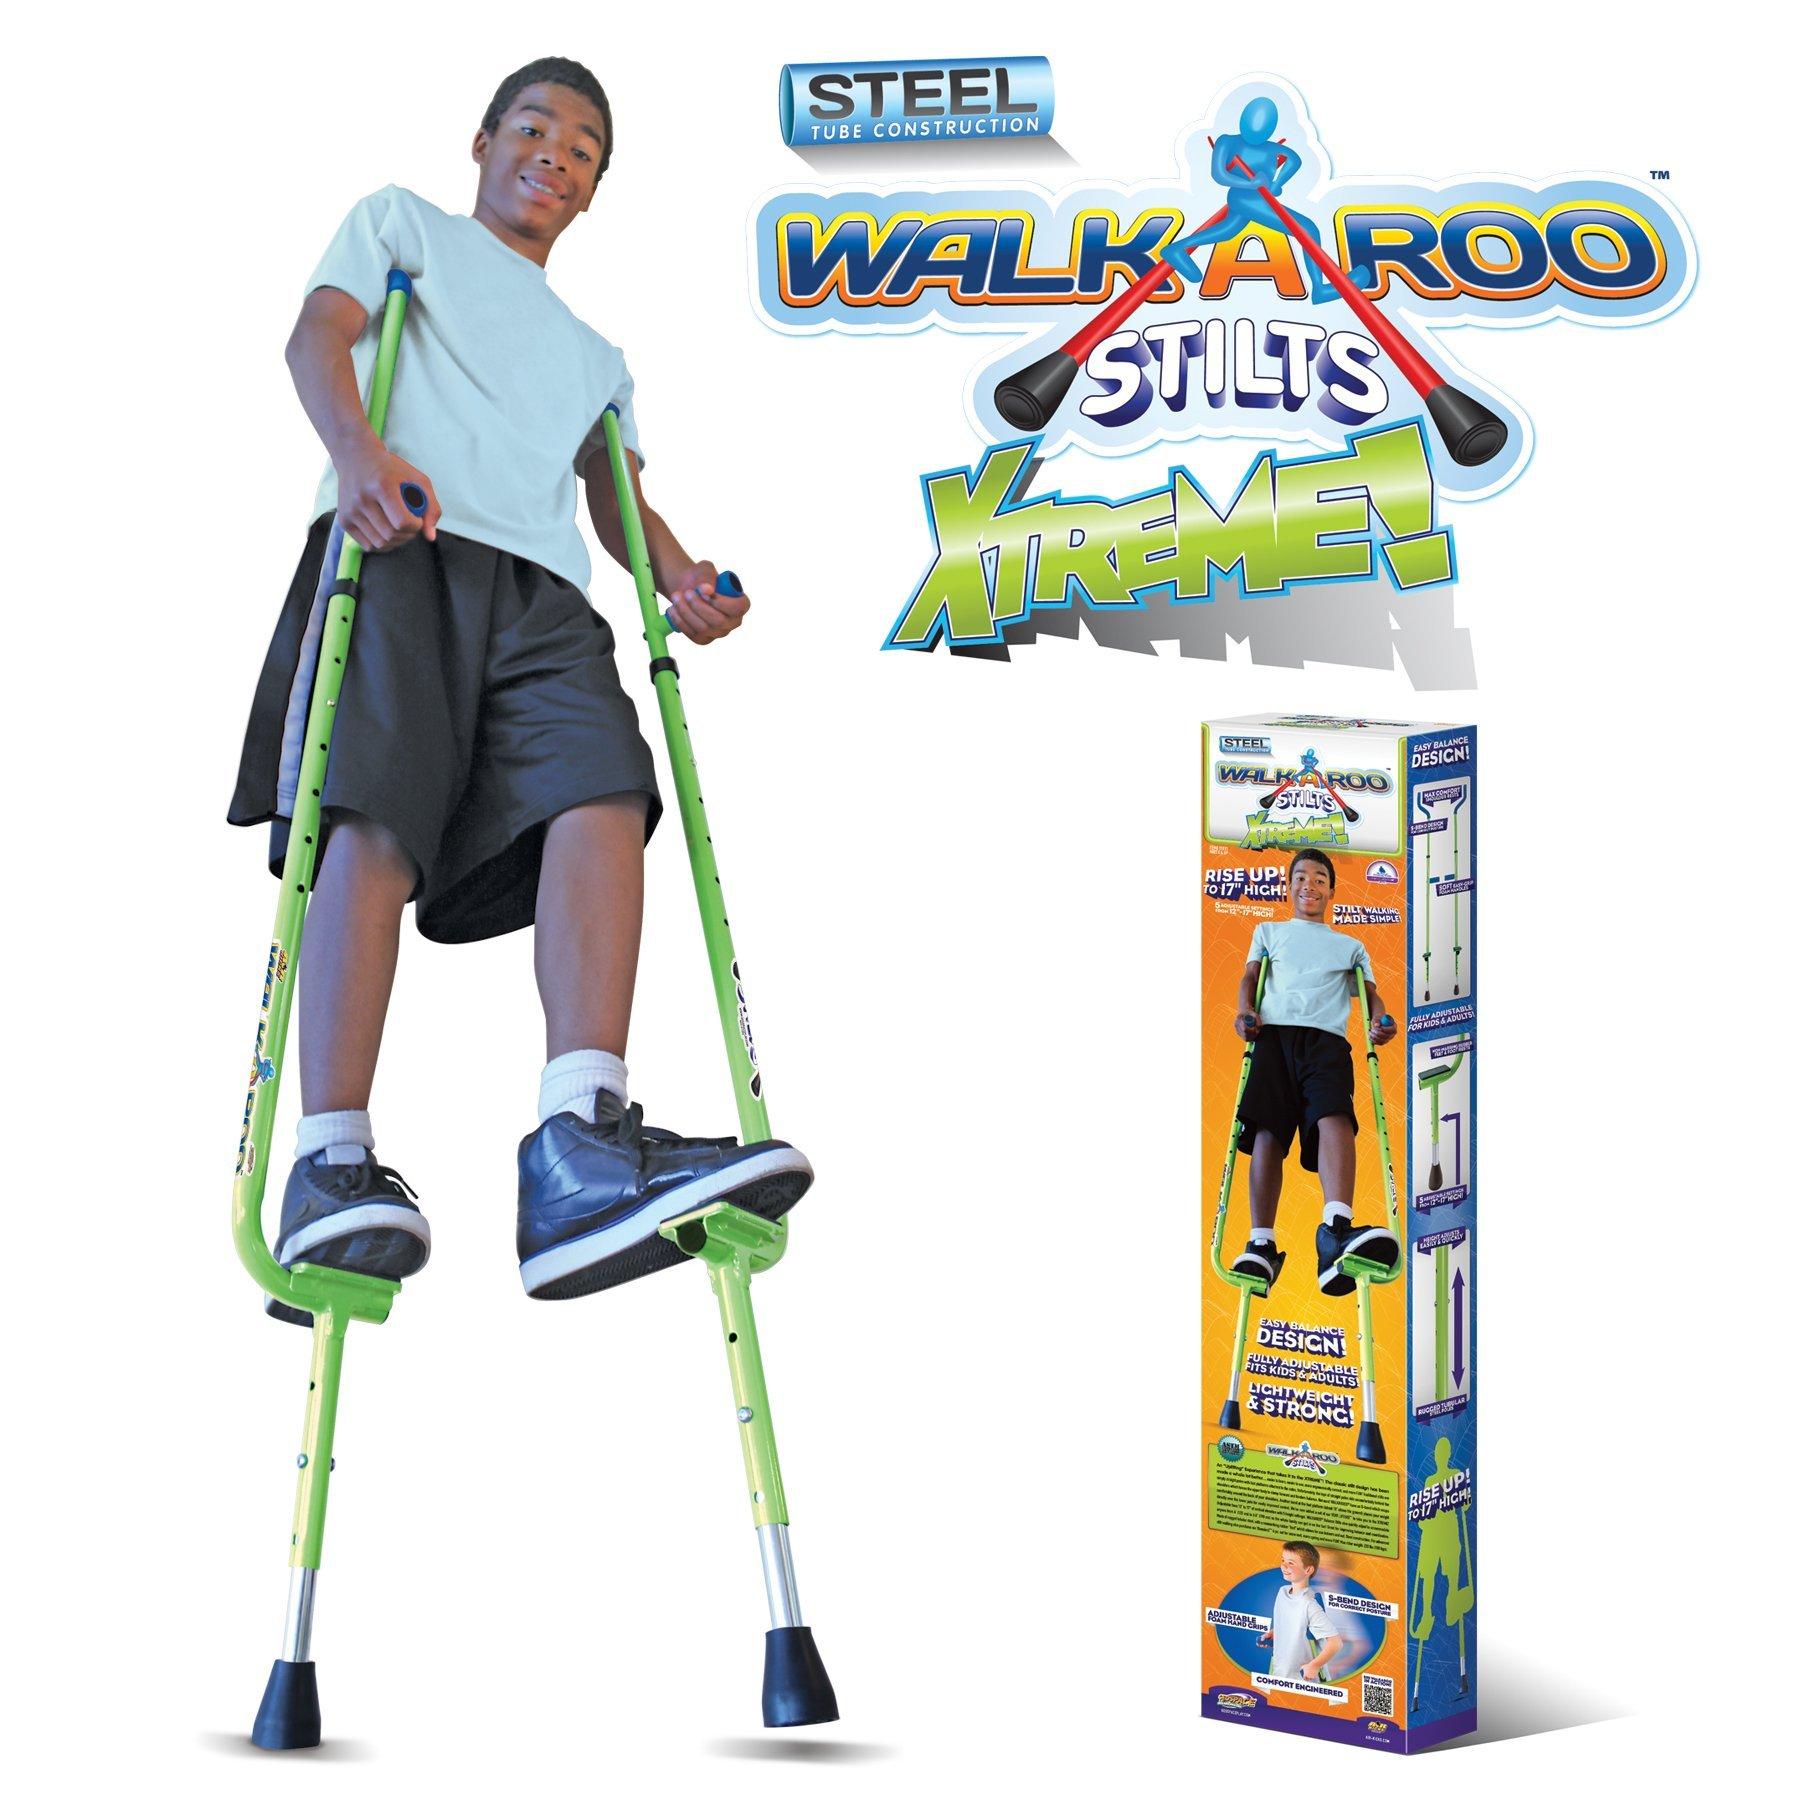 Geospace WALKAROO Xtreme Steel Balance Stilts with Height Adjustable Vert Lifters by Air Kicks (Renewed) by Geospace